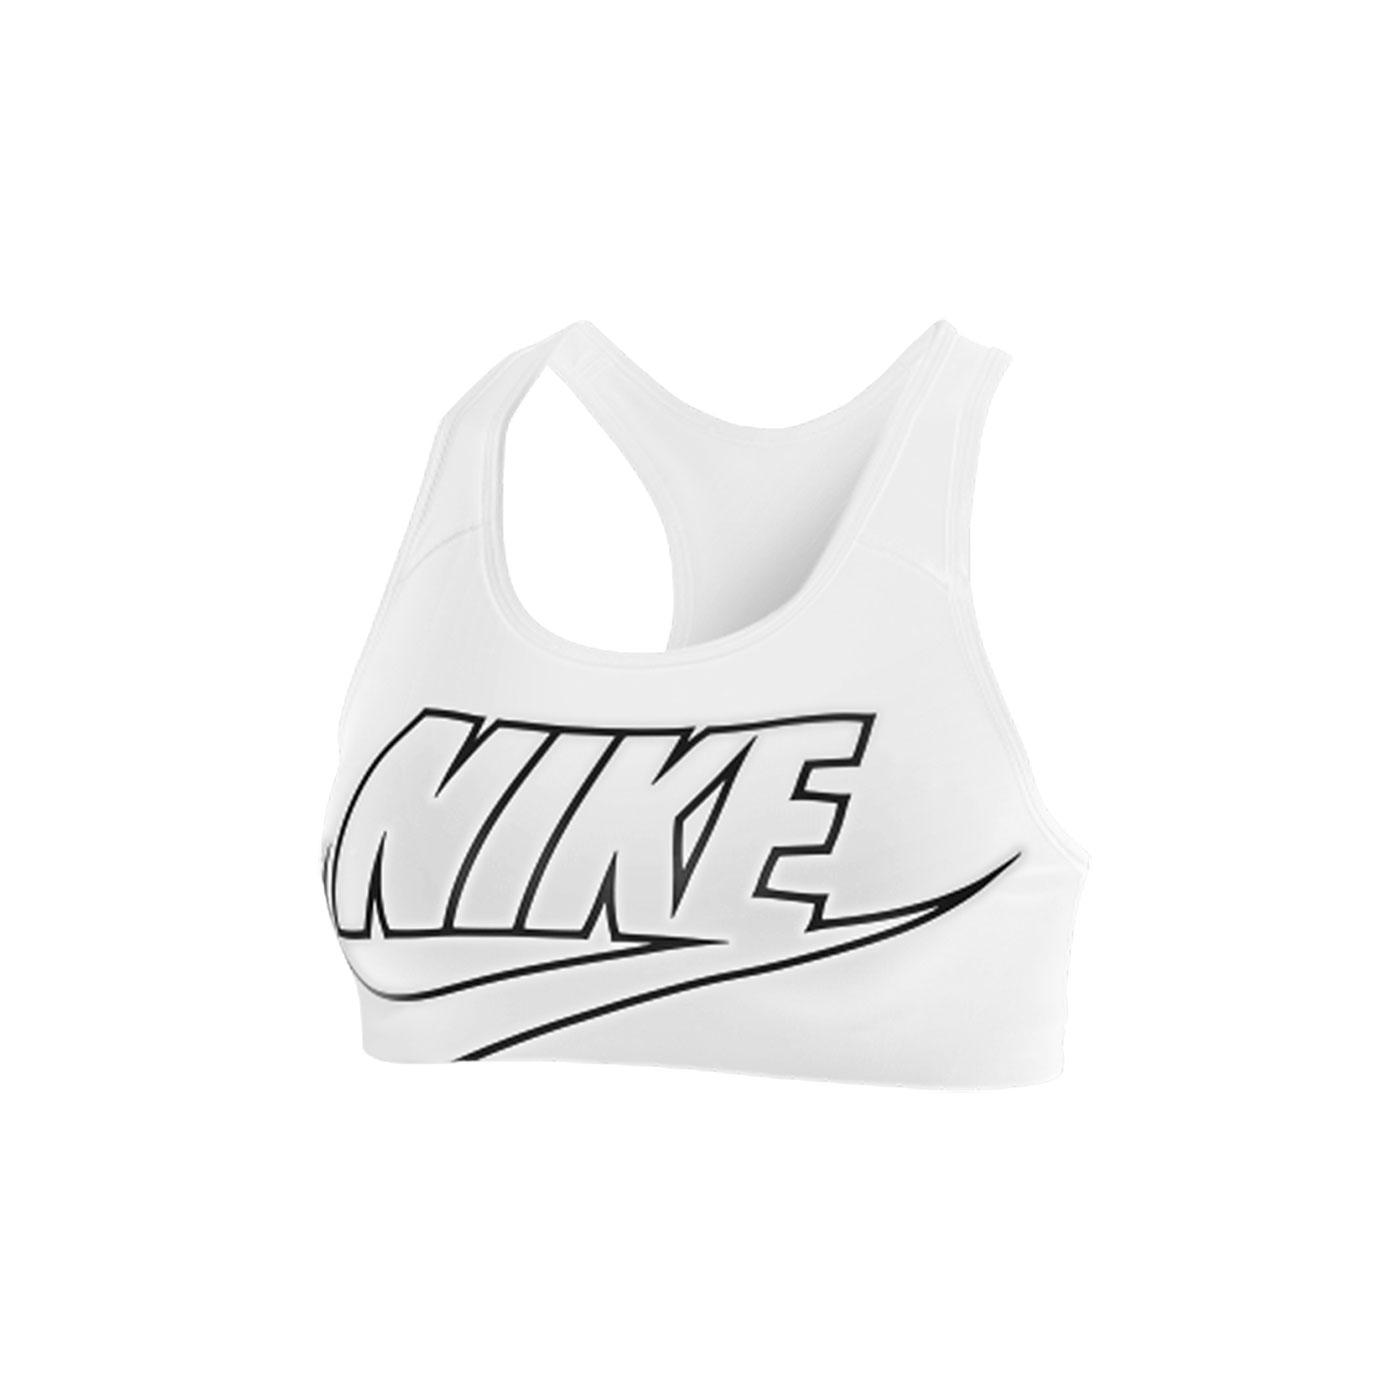 NIKE 女款中度支撐運動內衣 BV3644-010 - 白黑